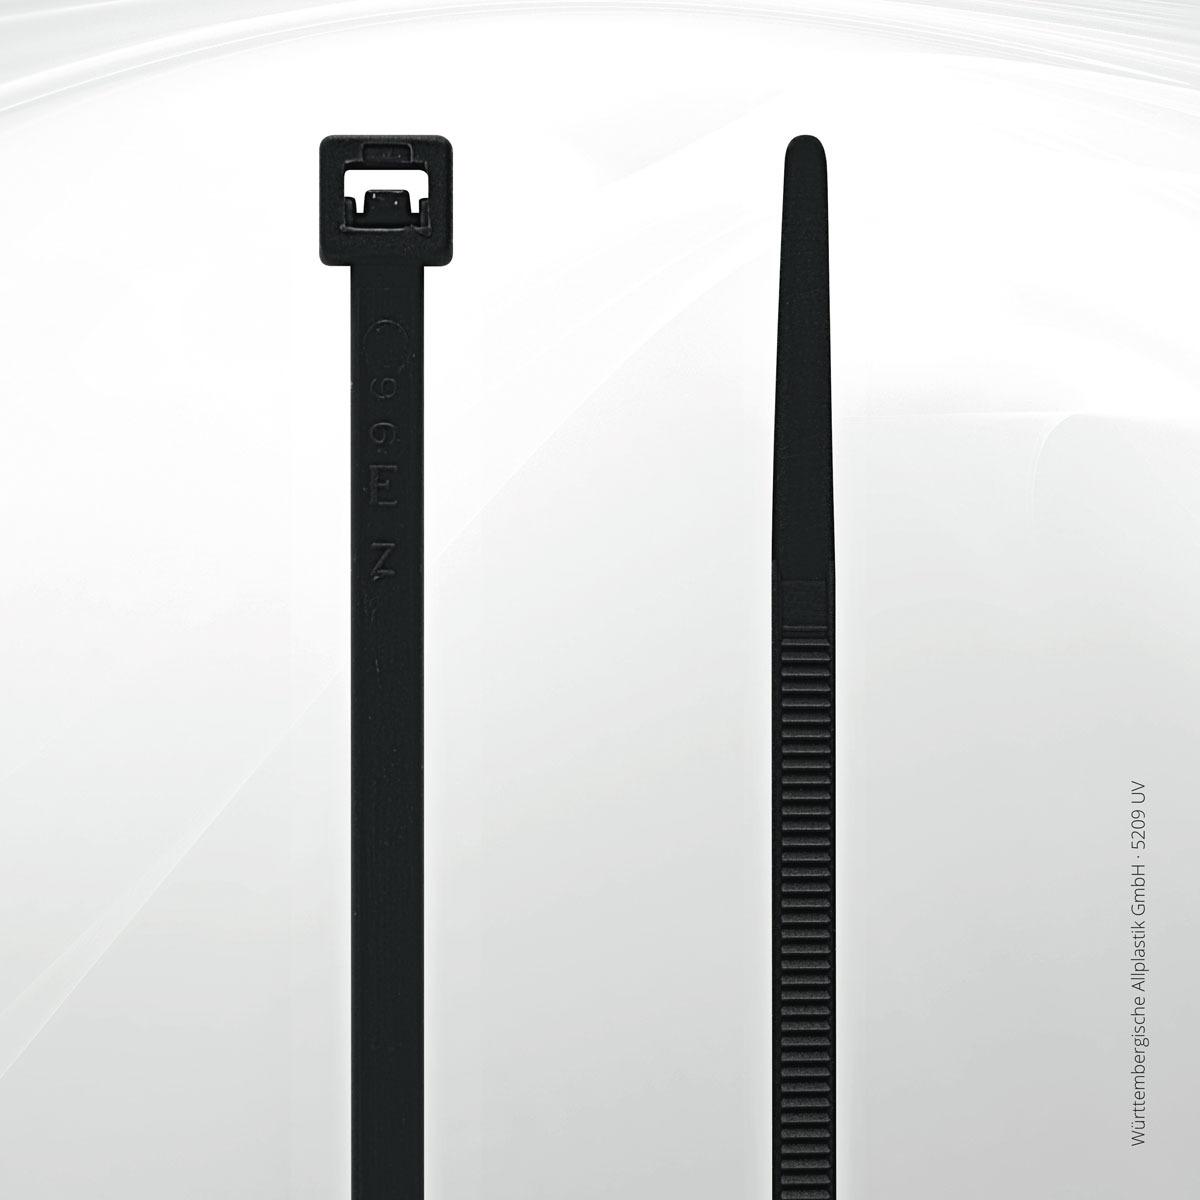 kabelbinder allplastik odporne na promieniowanie uv allplastik. Black Bedroom Furniture Sets. Home Design Ideas